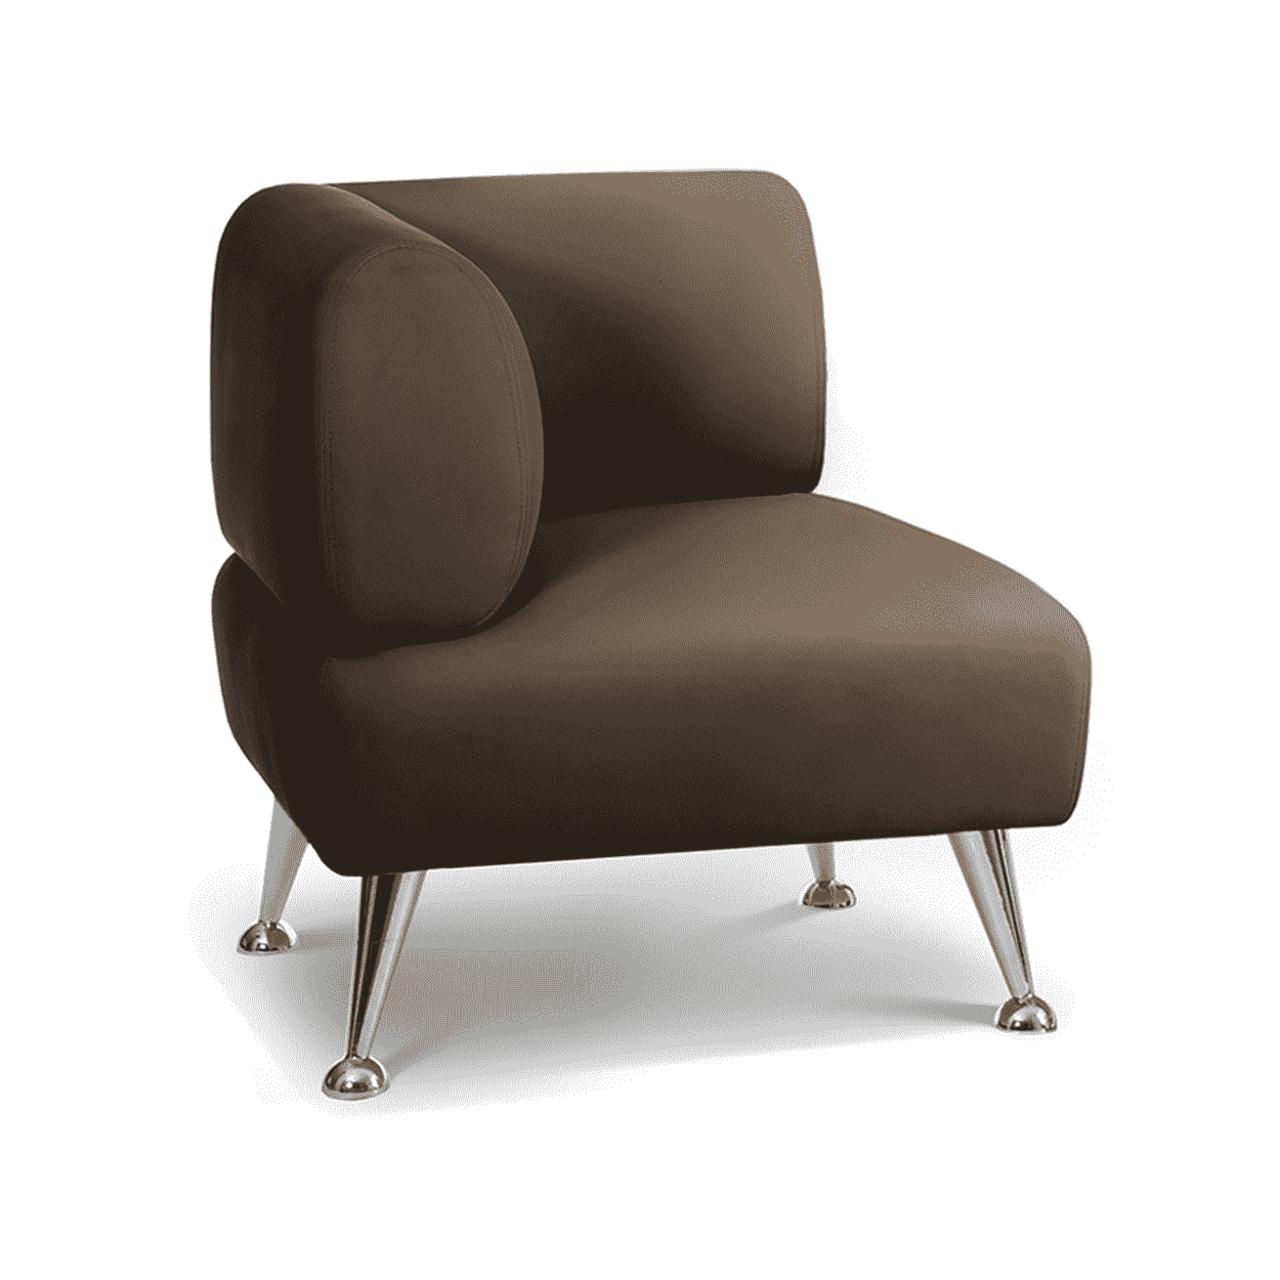 Кресло левое  Калипсо 84x71x77 - фото 2